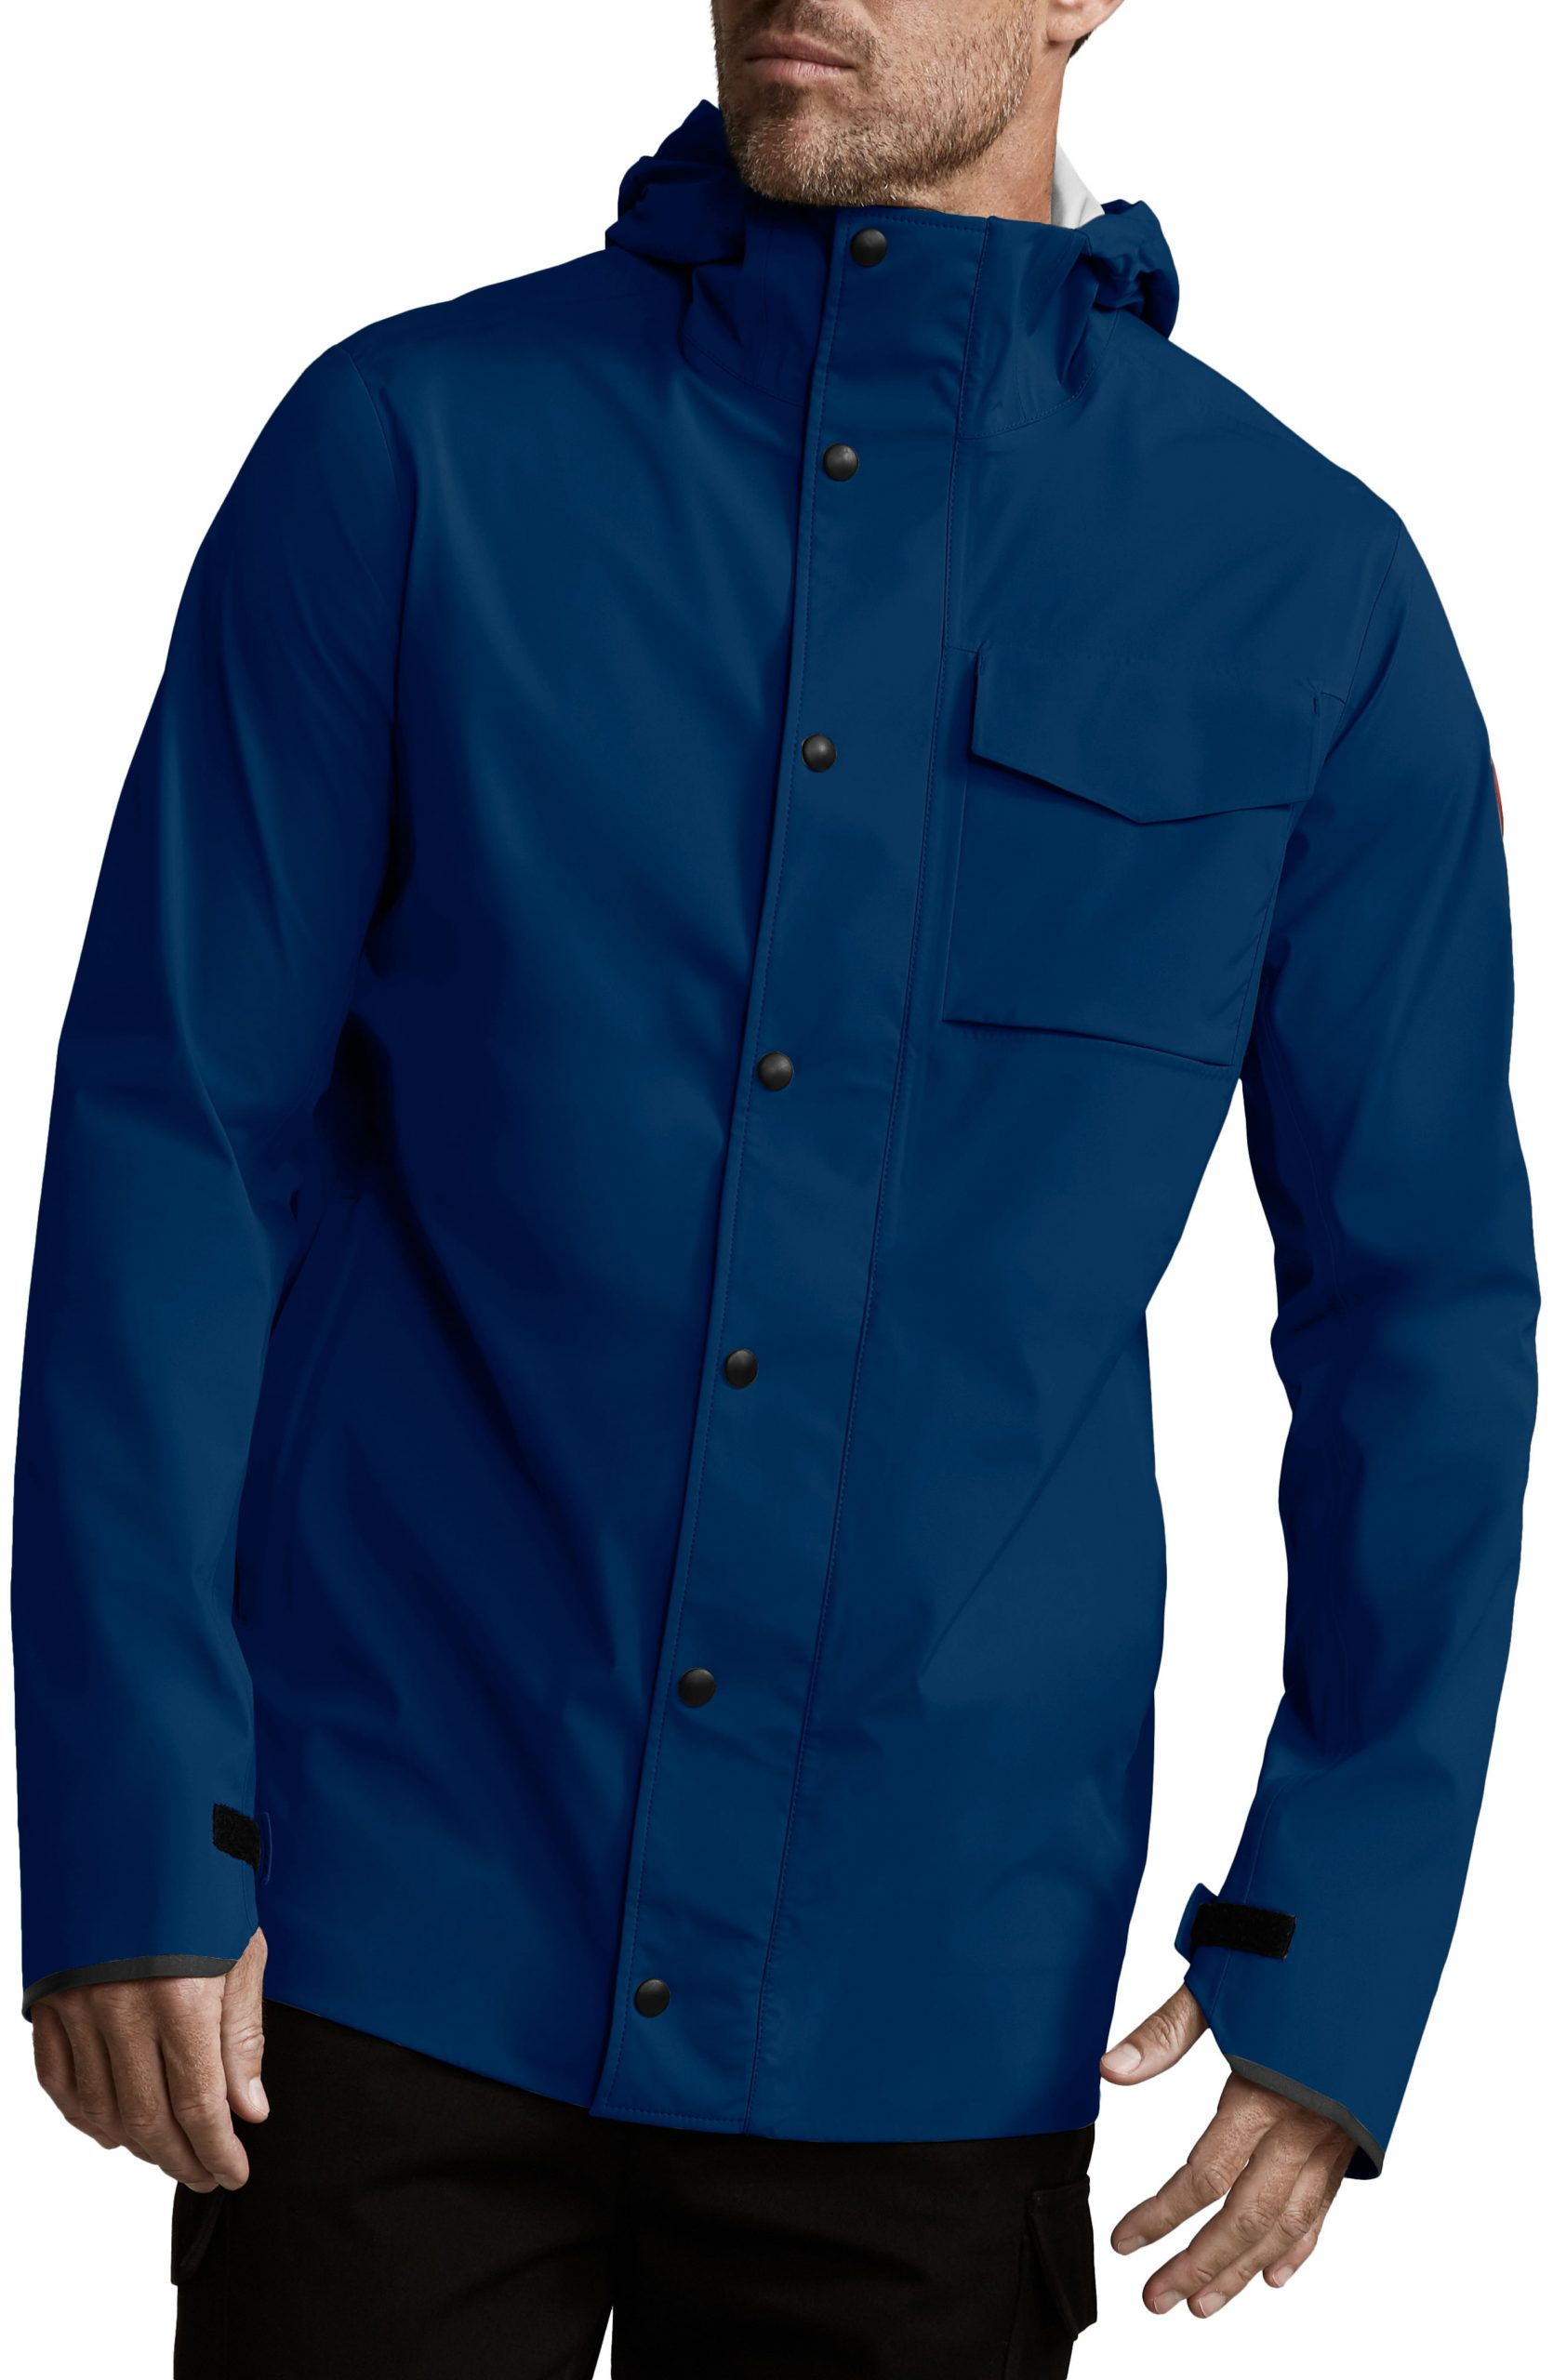 Men's Canada Goose Nanaimo Windproof/waterproof Jacket, Size Large - Blue